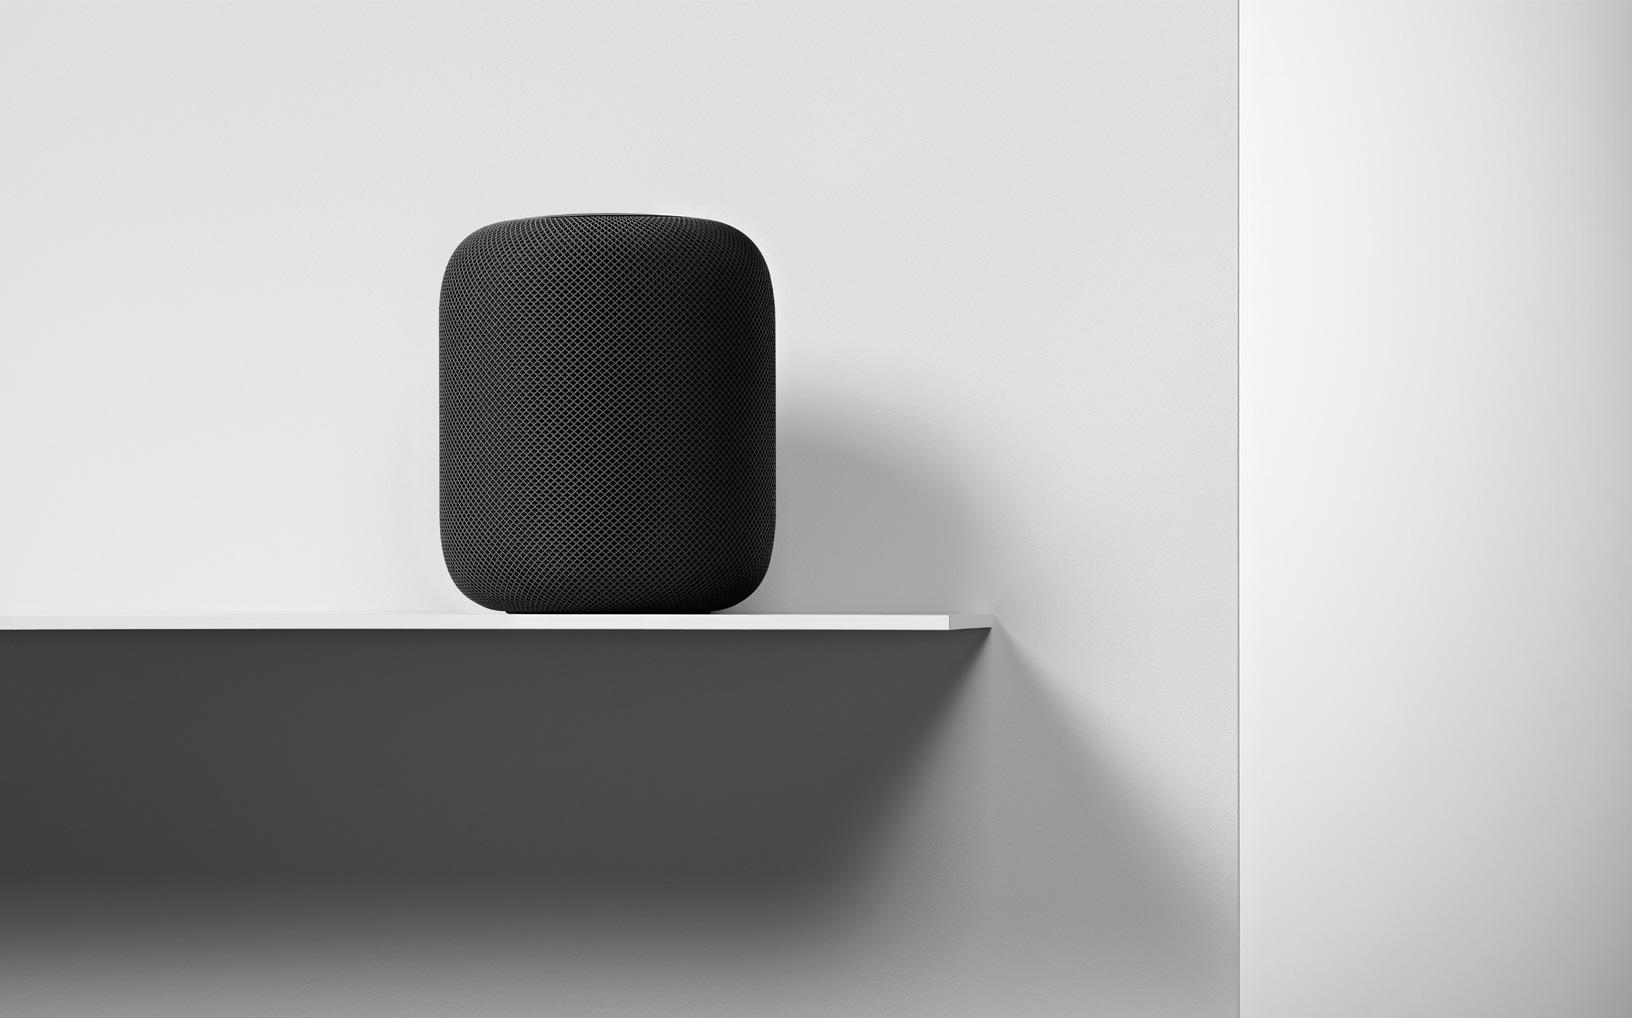 Apple、「HomePod」の発売日を2月9日に決定。26日から注文開始